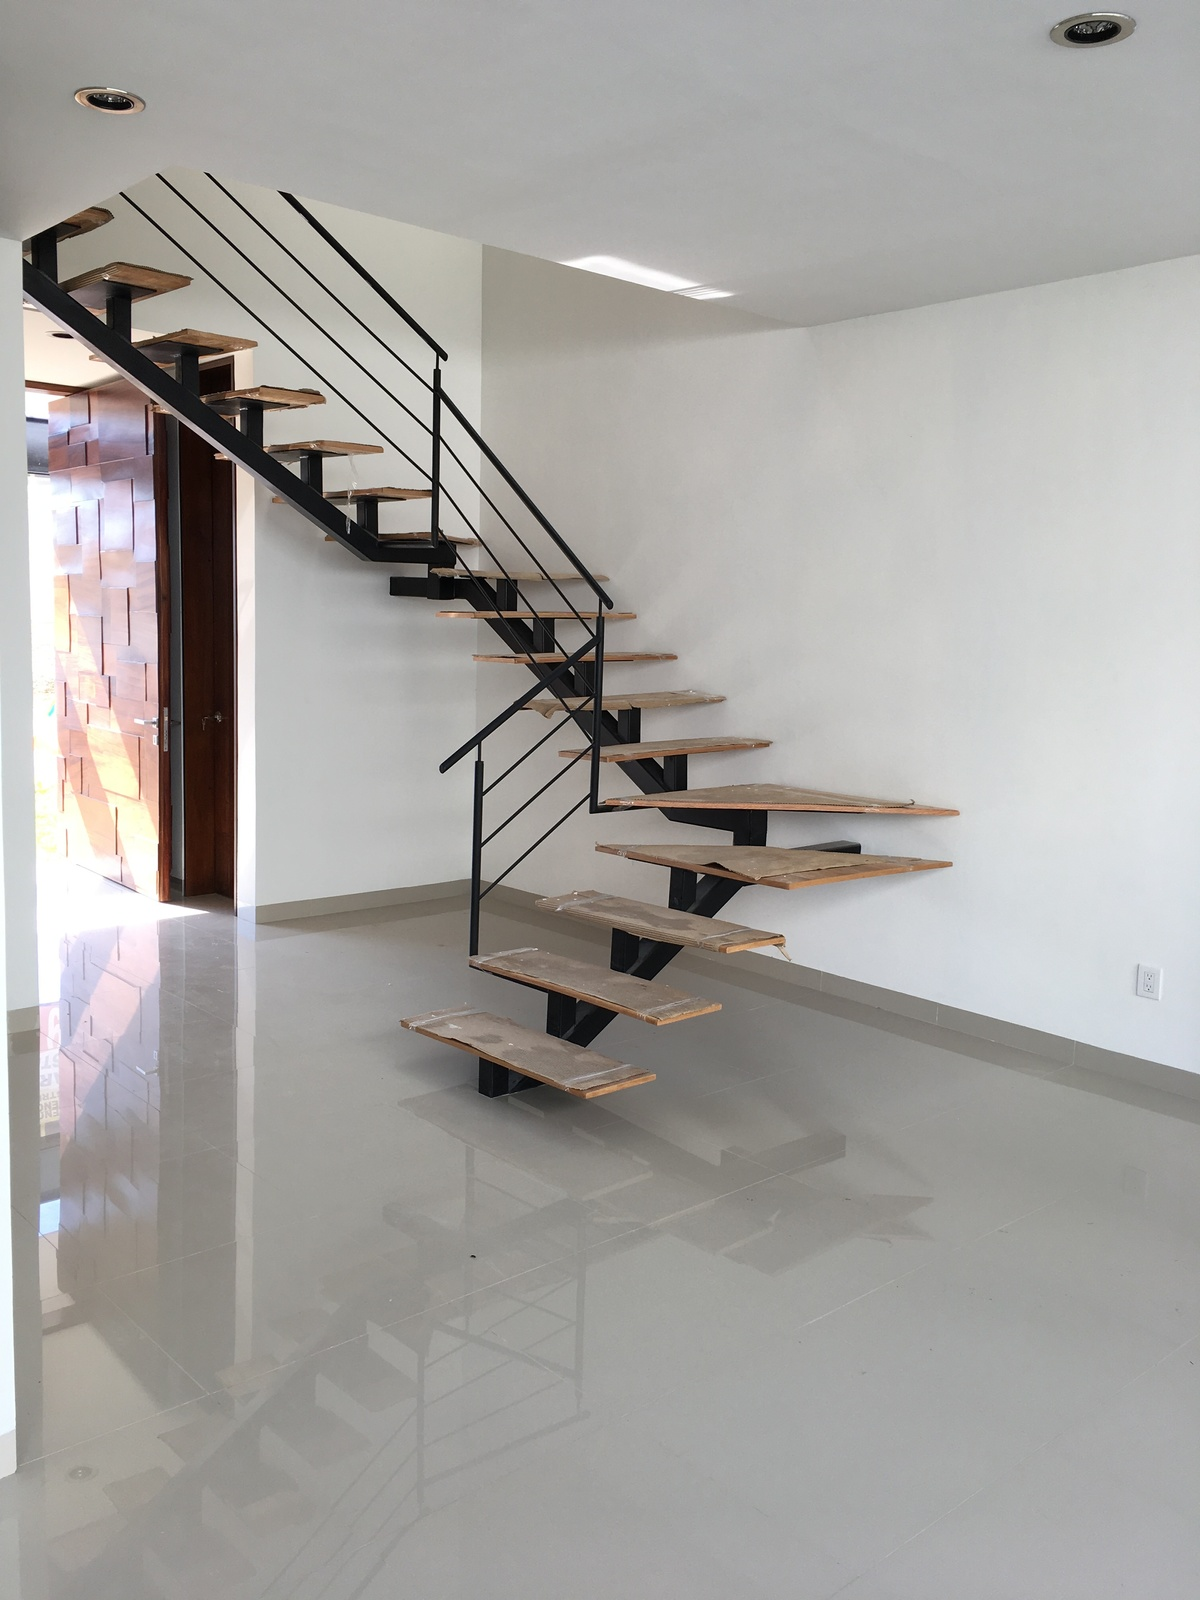 2 de 17: Escaleras al segundo nivel